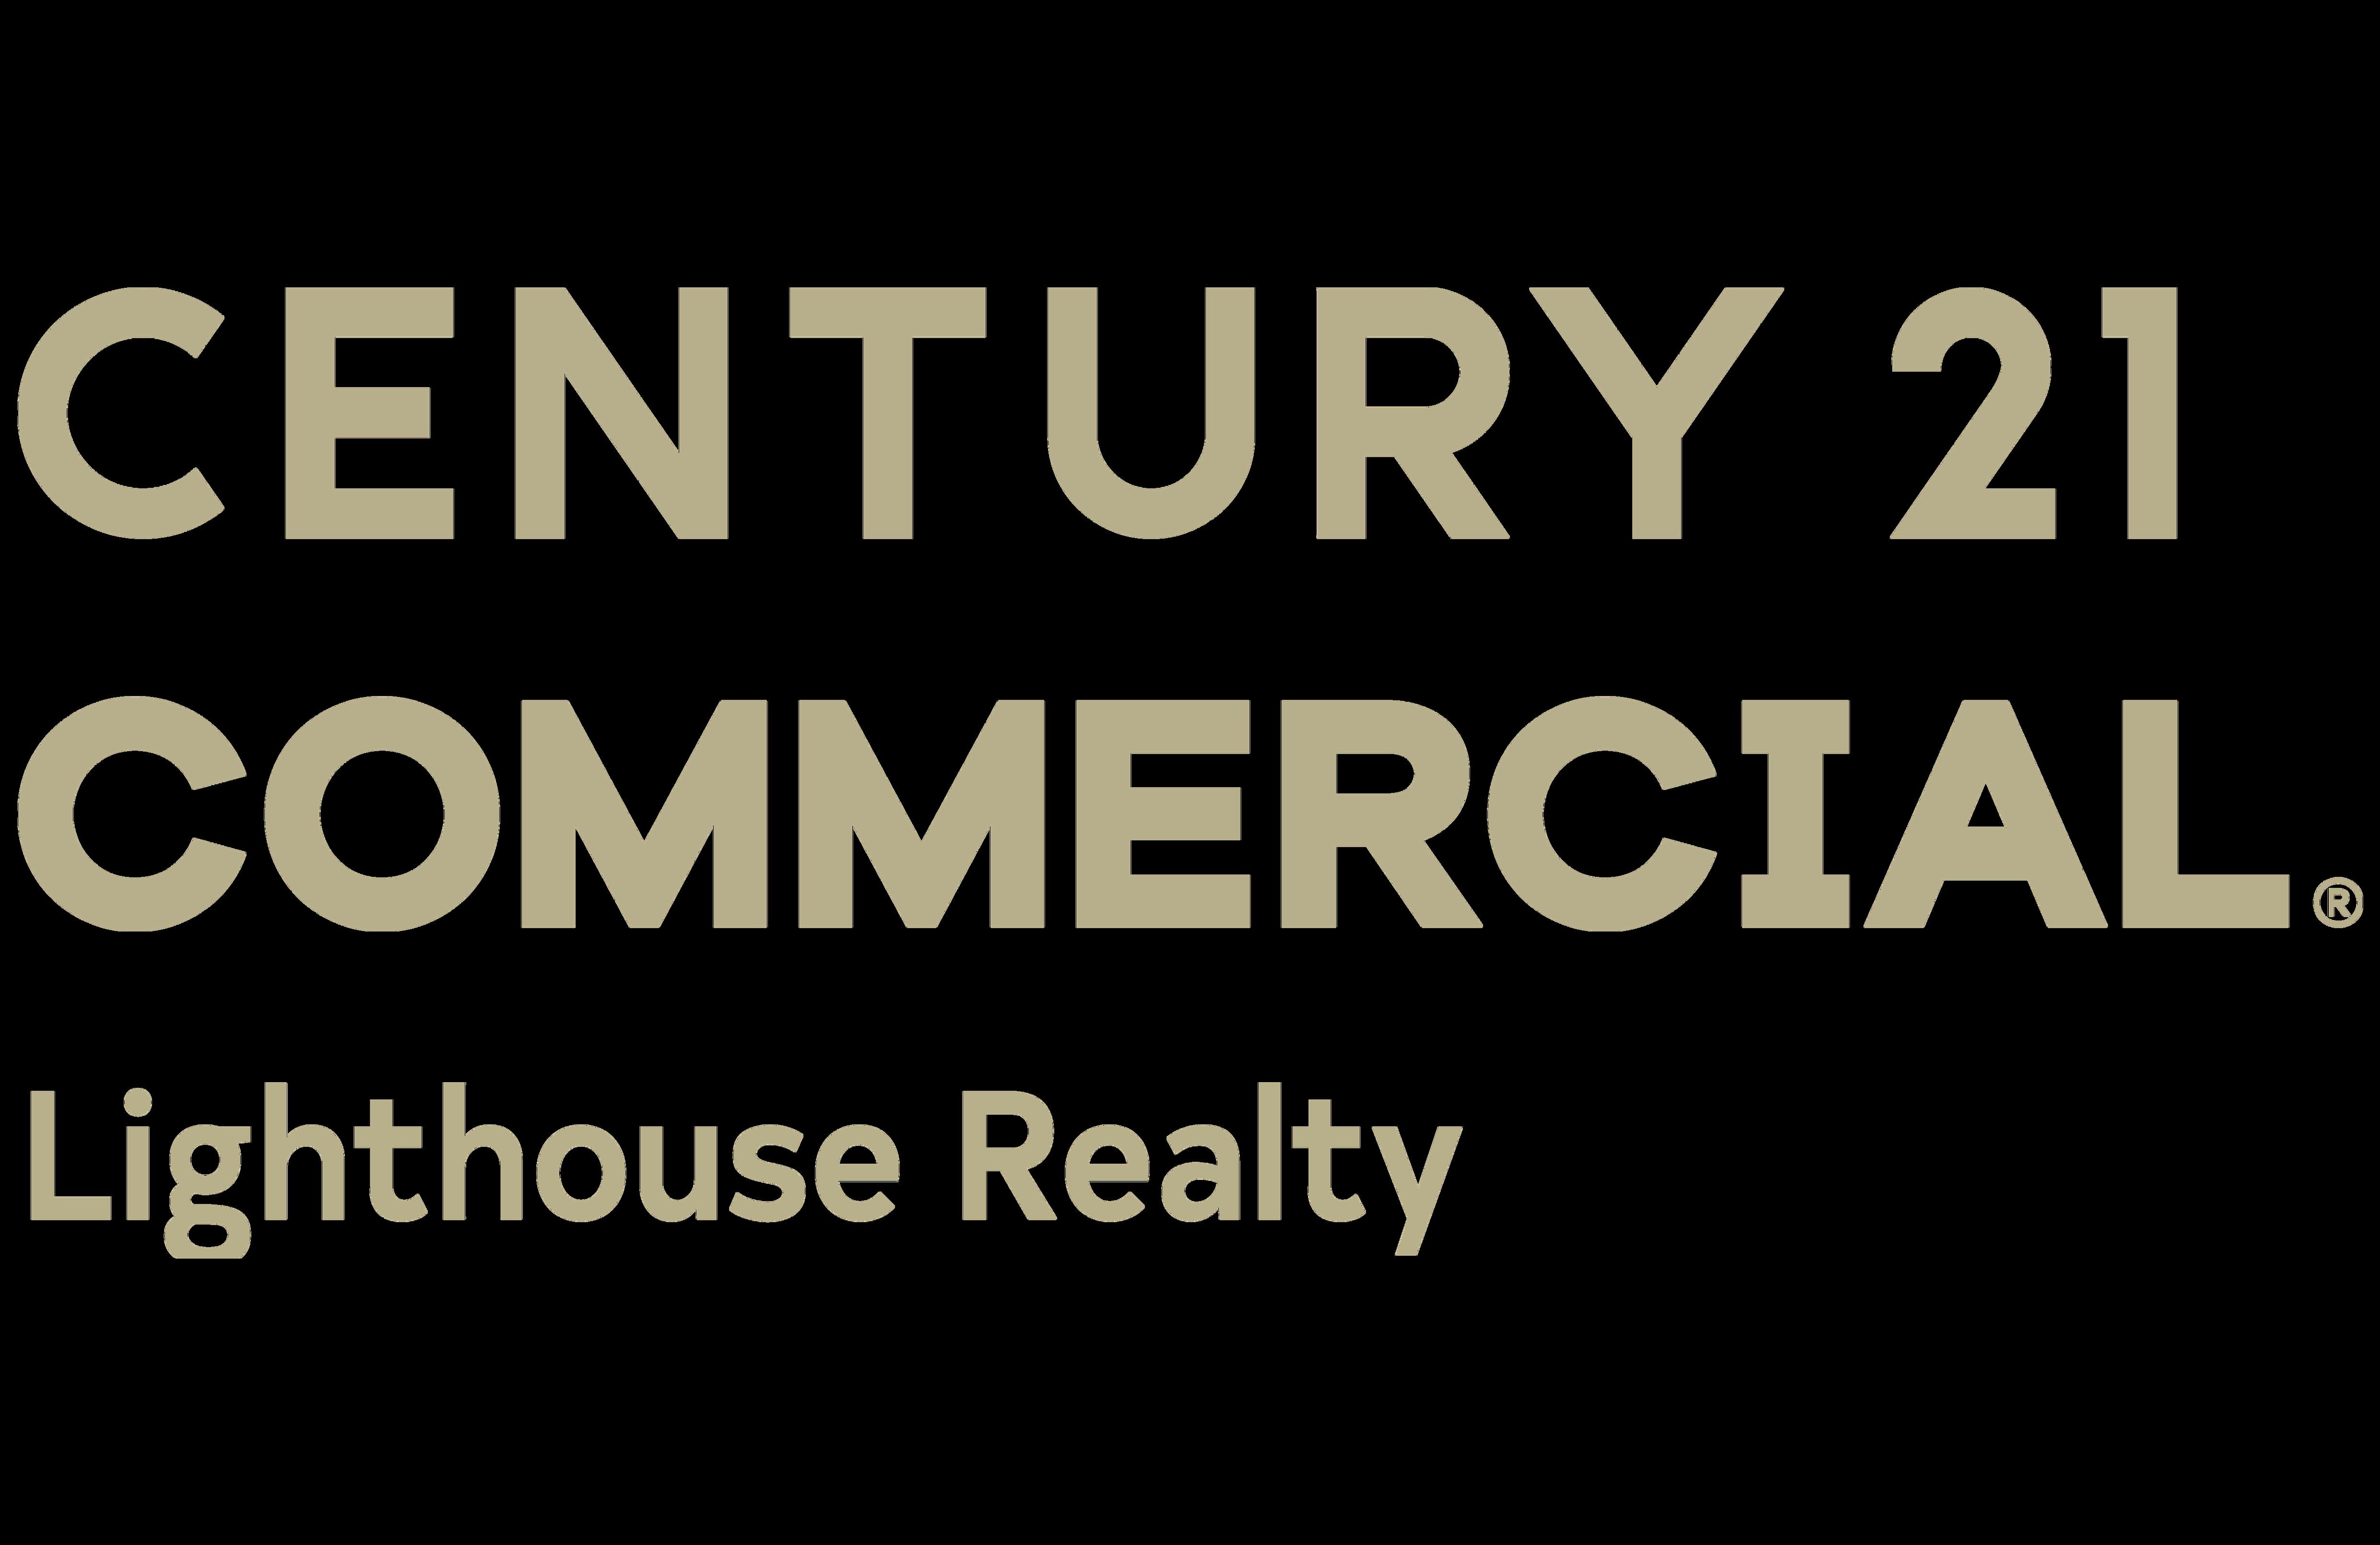 CENTURY 21 Lighthouse Realty